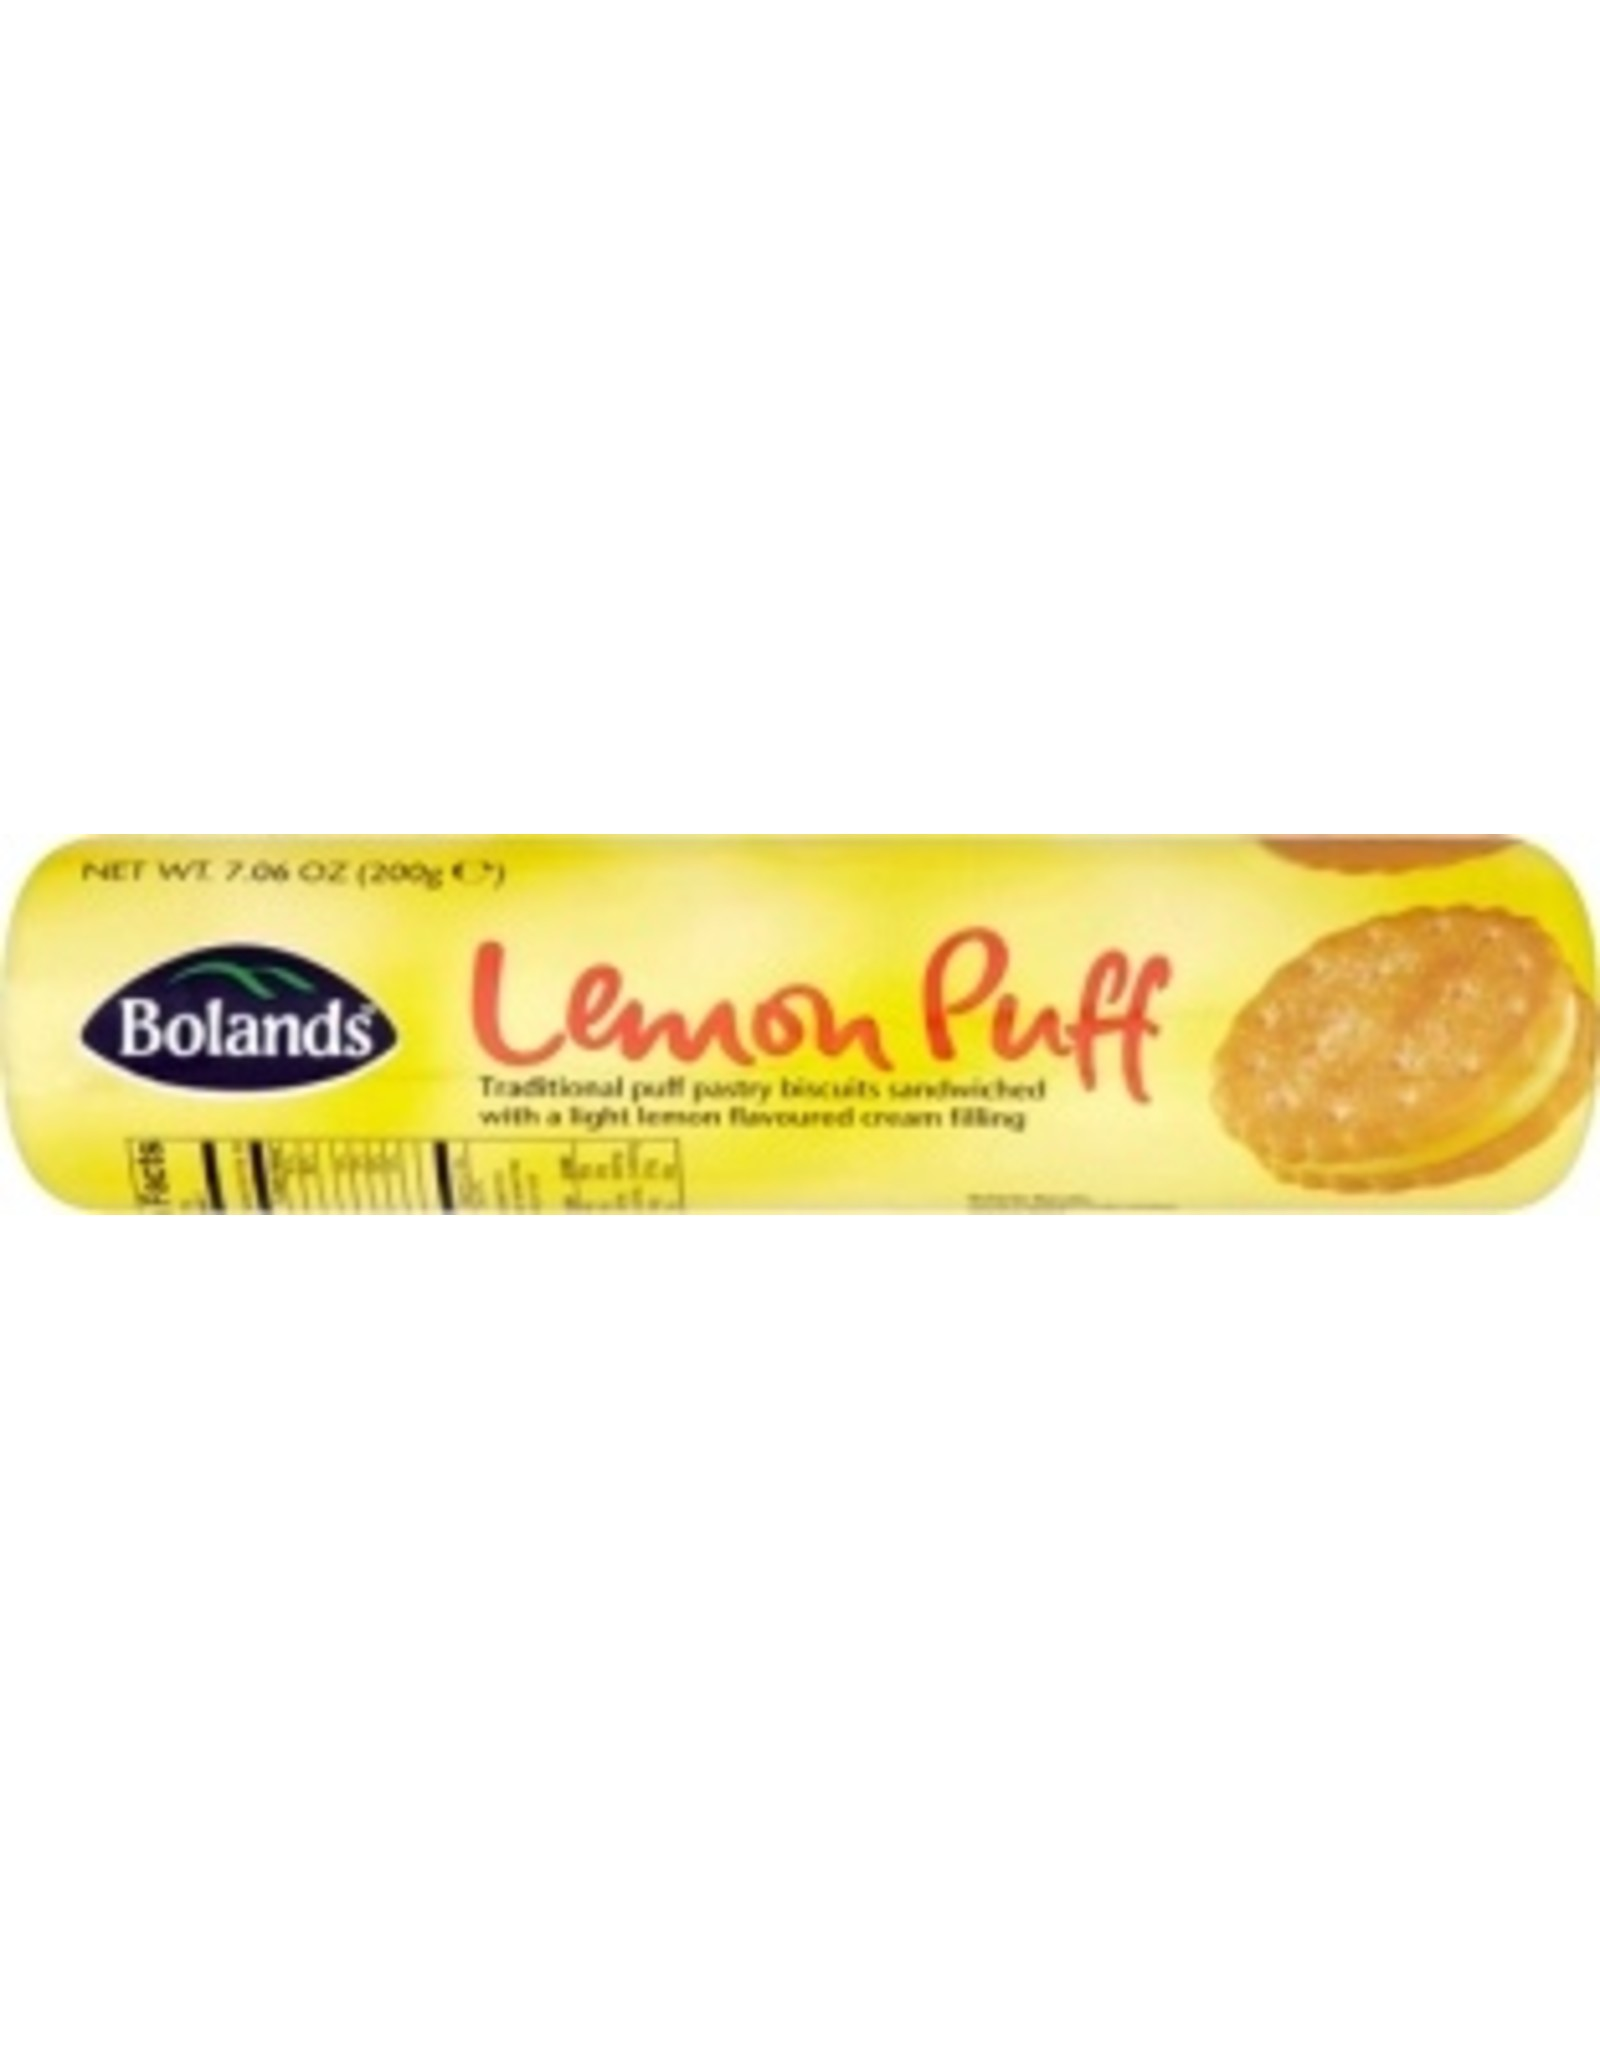 Bolands Bolands Lemon Puffs